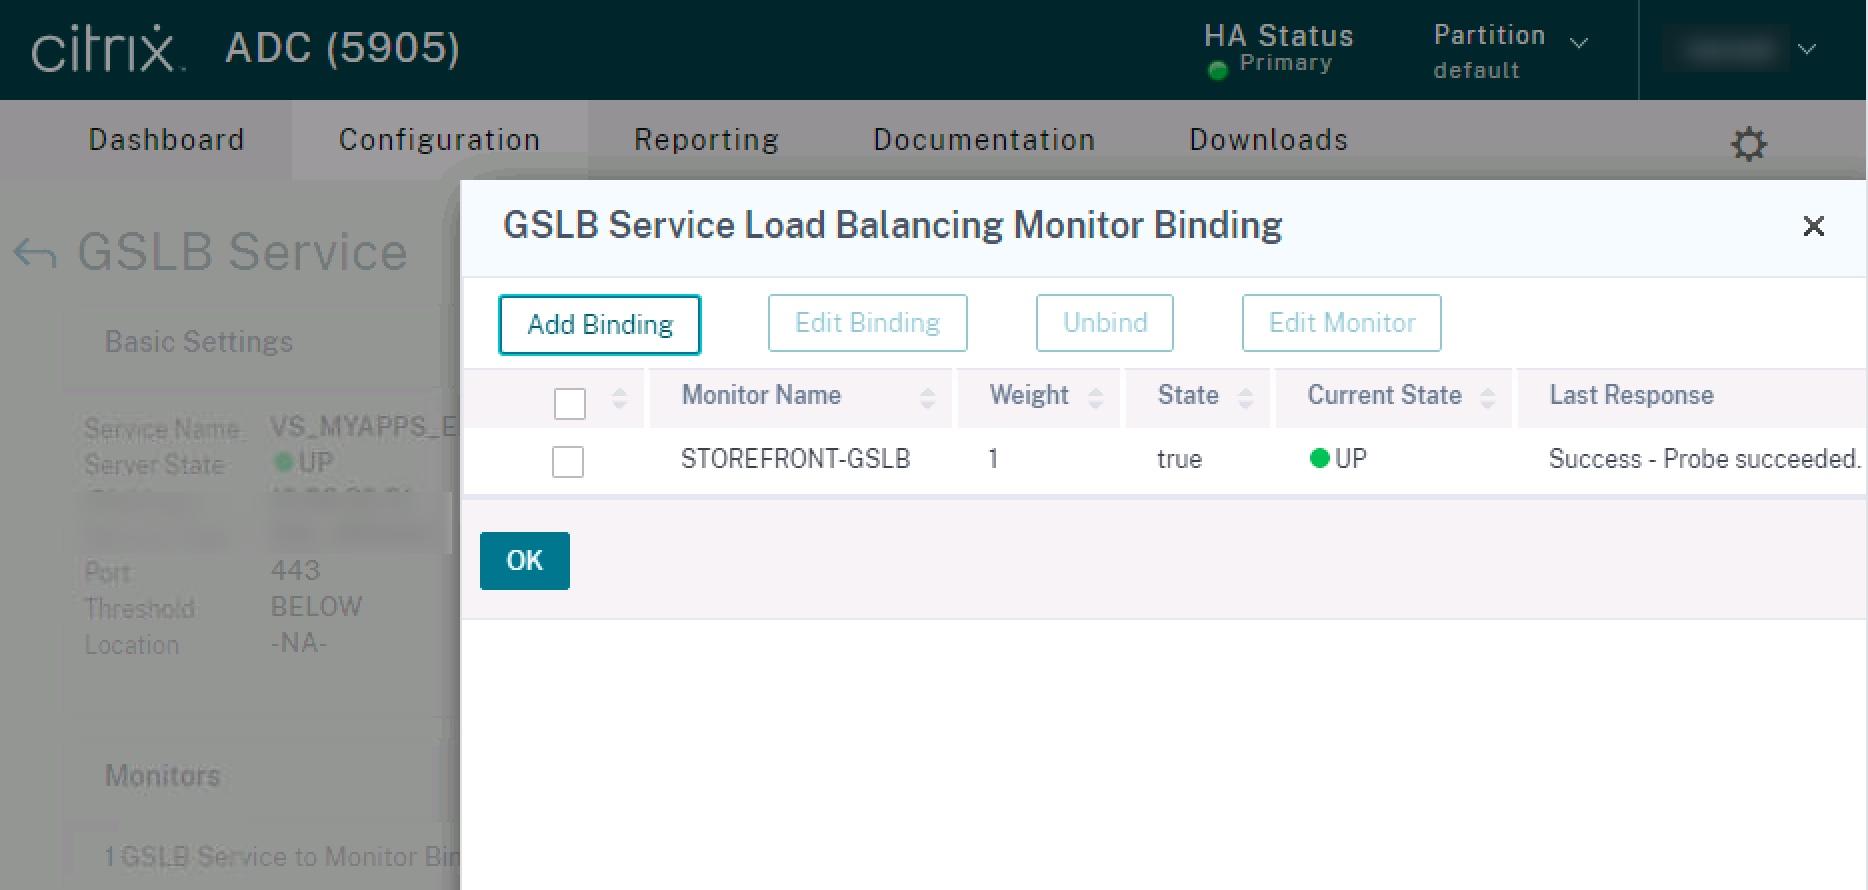 citrix gslb service bind custom storefront monitor